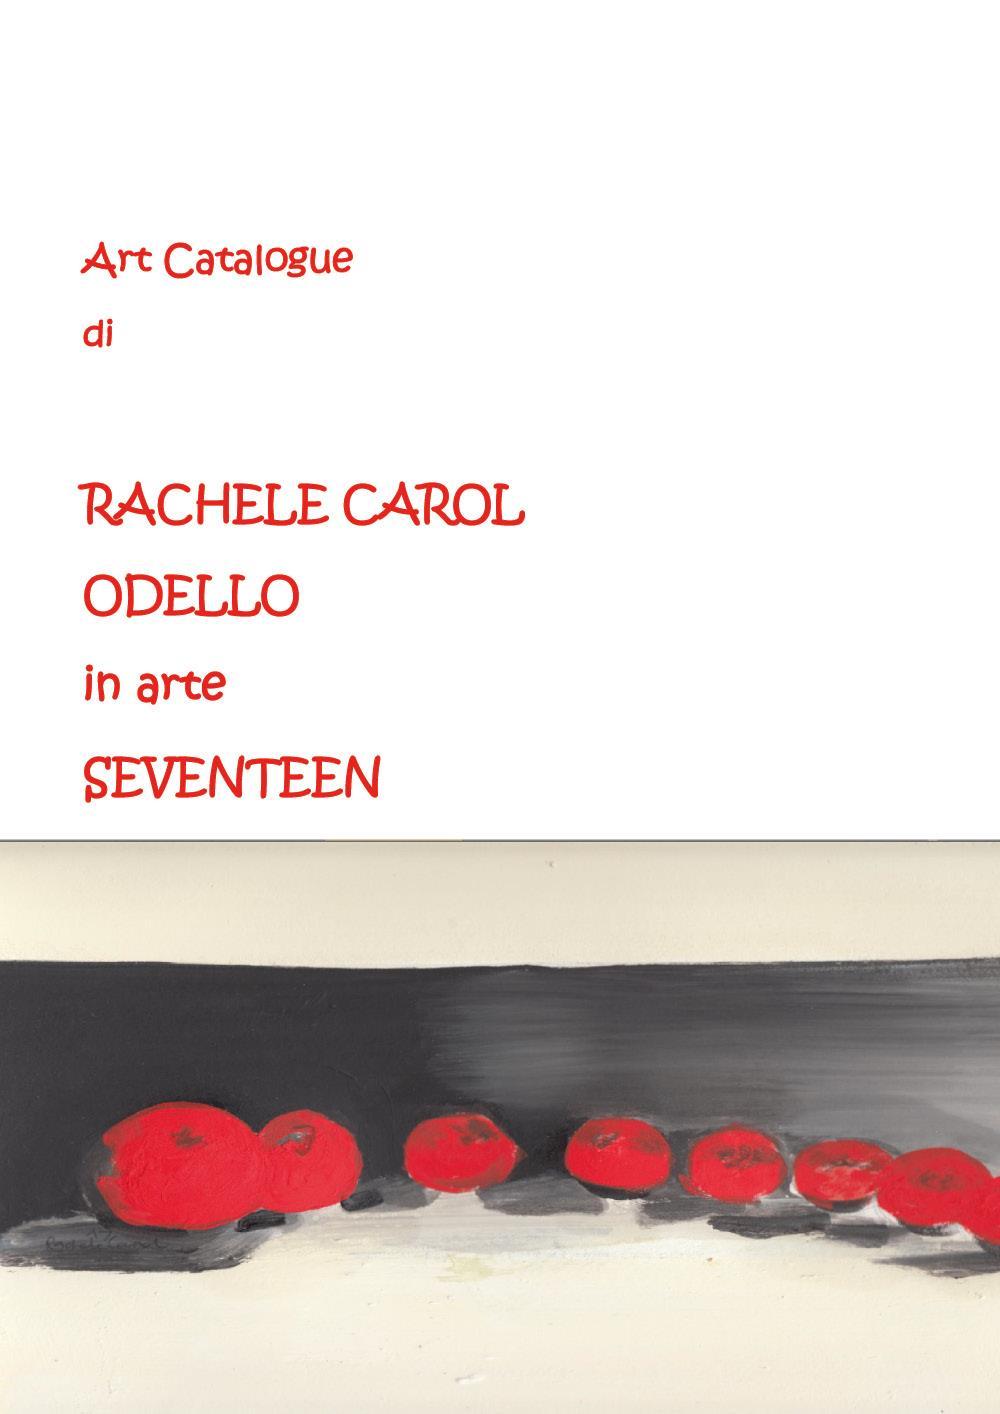 Art Catalogue di Rachele Carol Odello in arte Seventeen